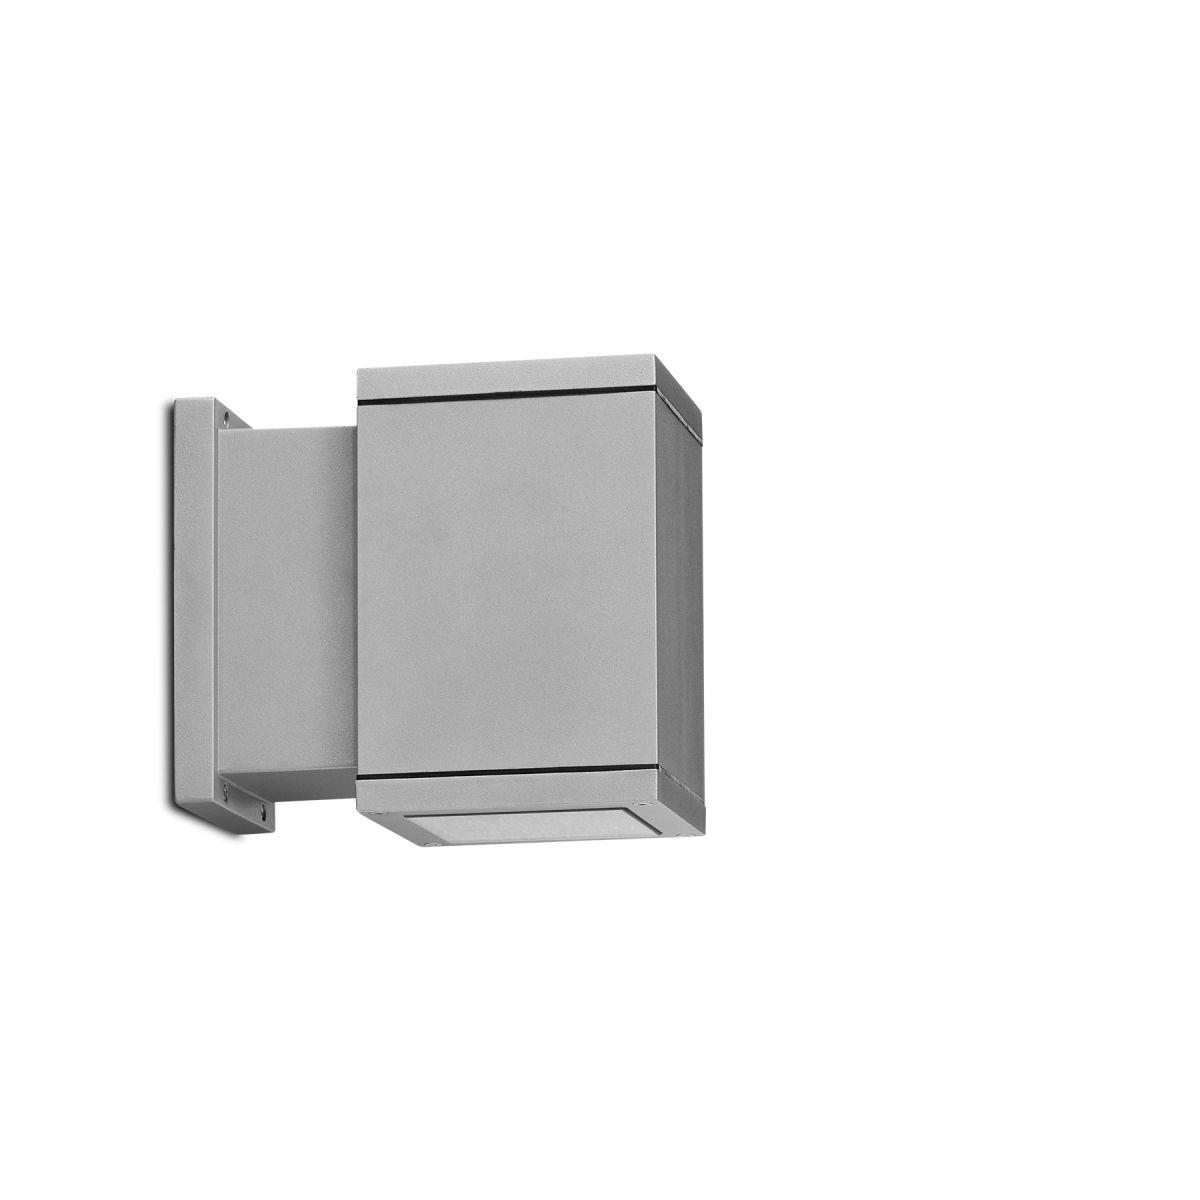 Maxi CORE - Single Lamp Wall Up/Downlight